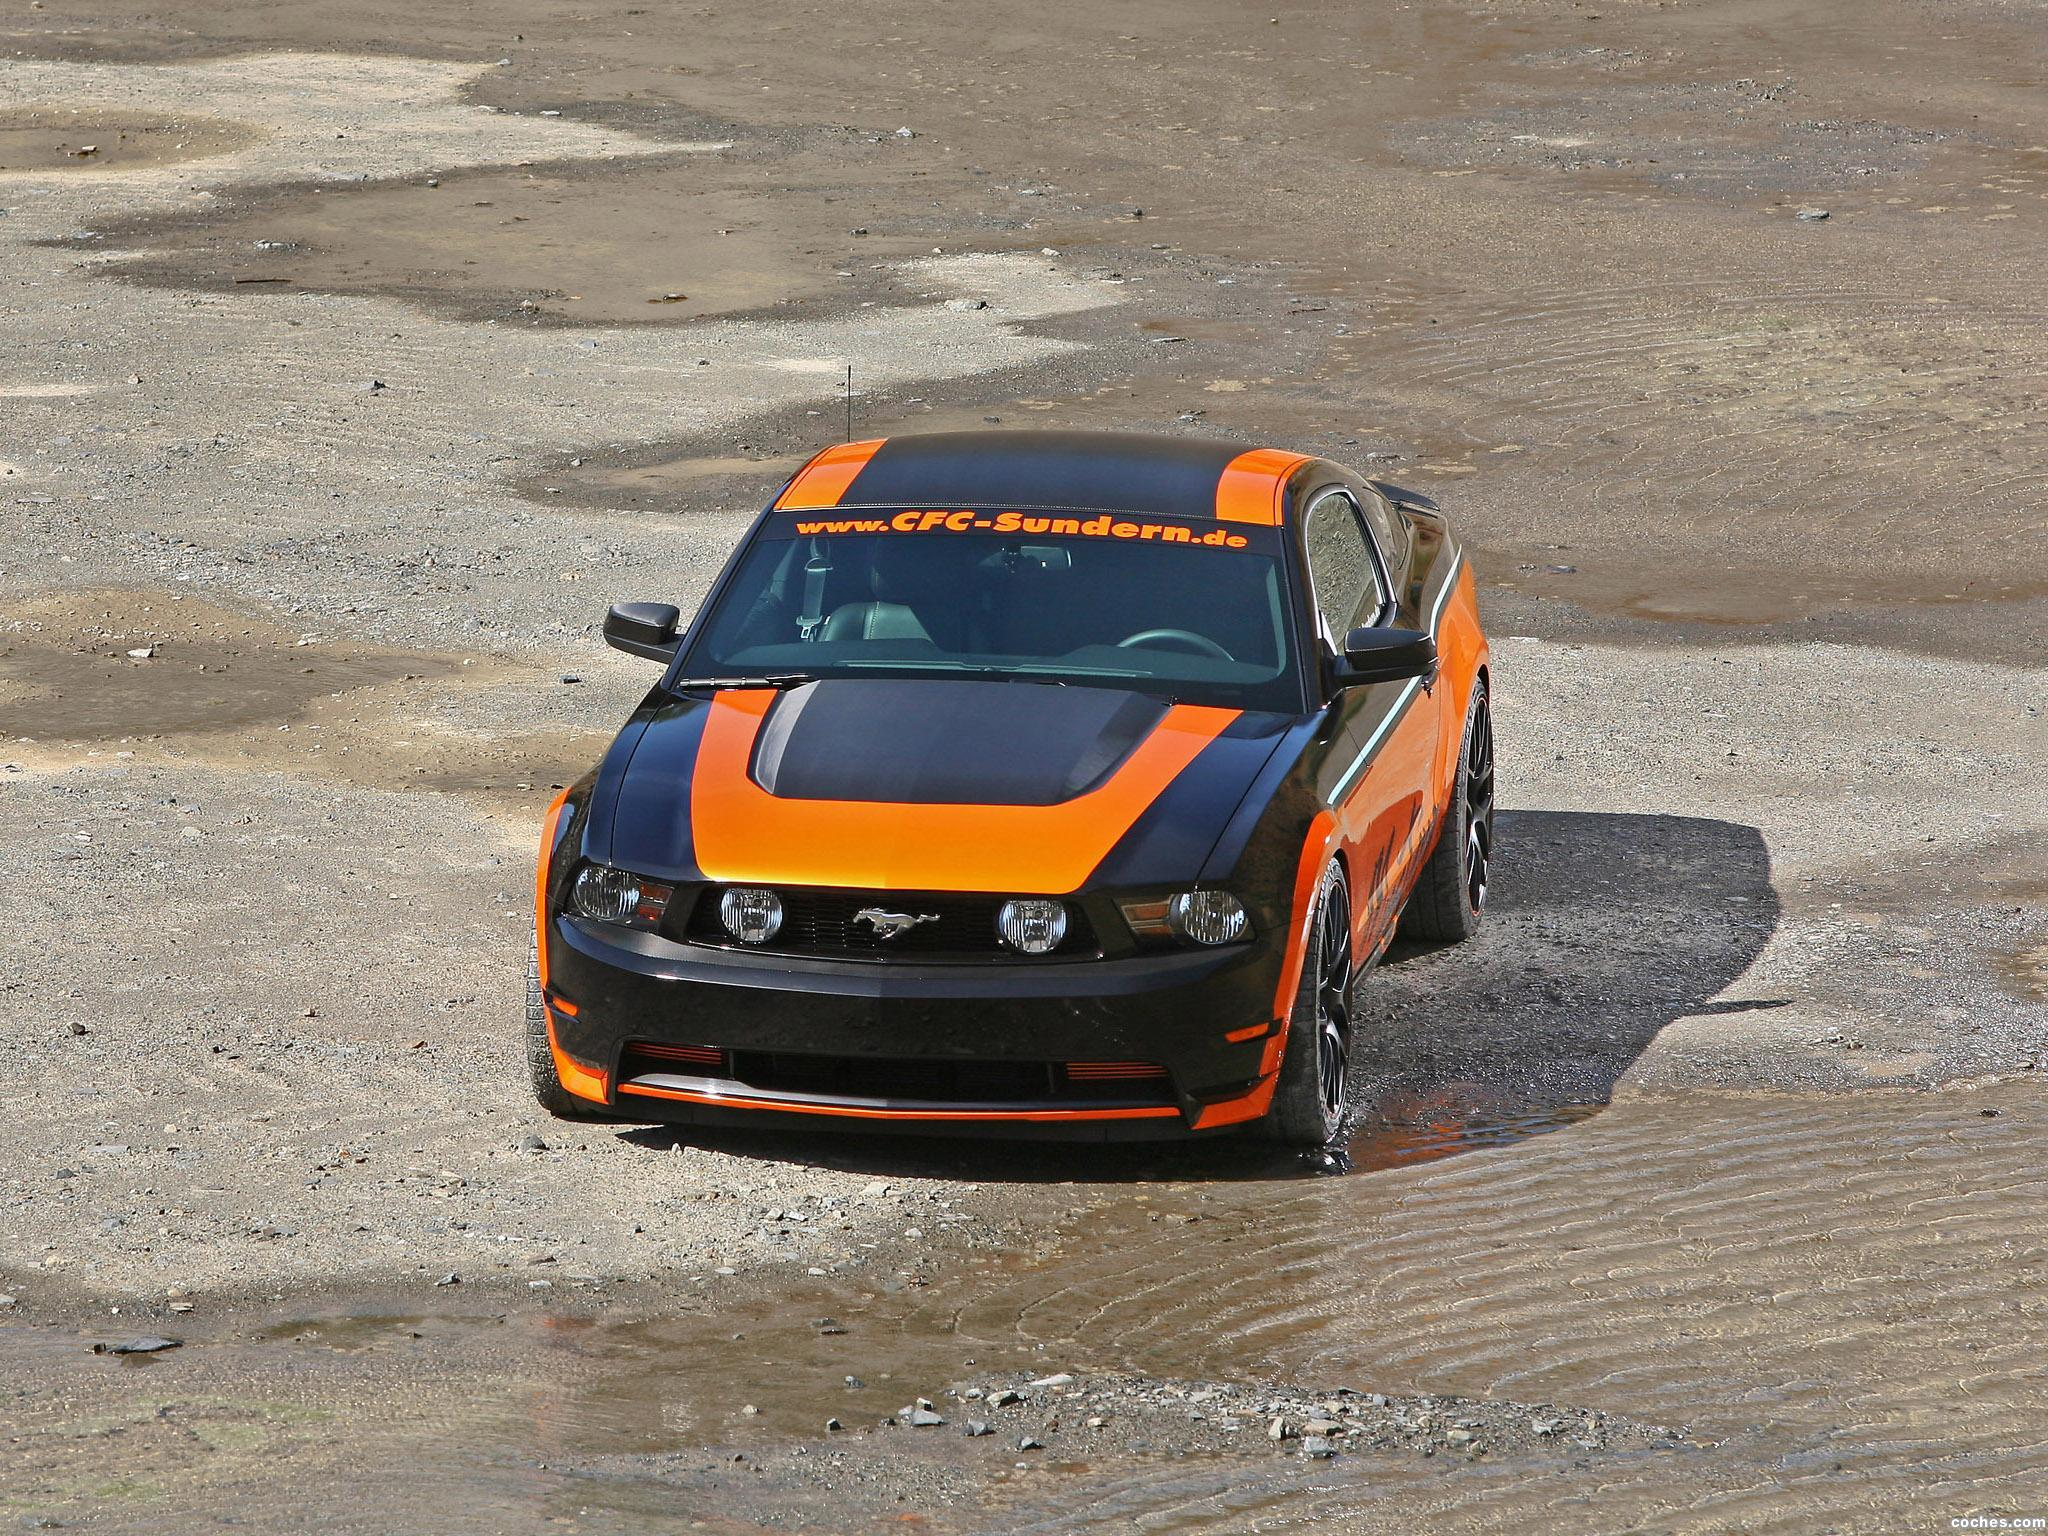 Foto 7 de CFC Ford Mustang Sundern World Marko Mennekes 2011